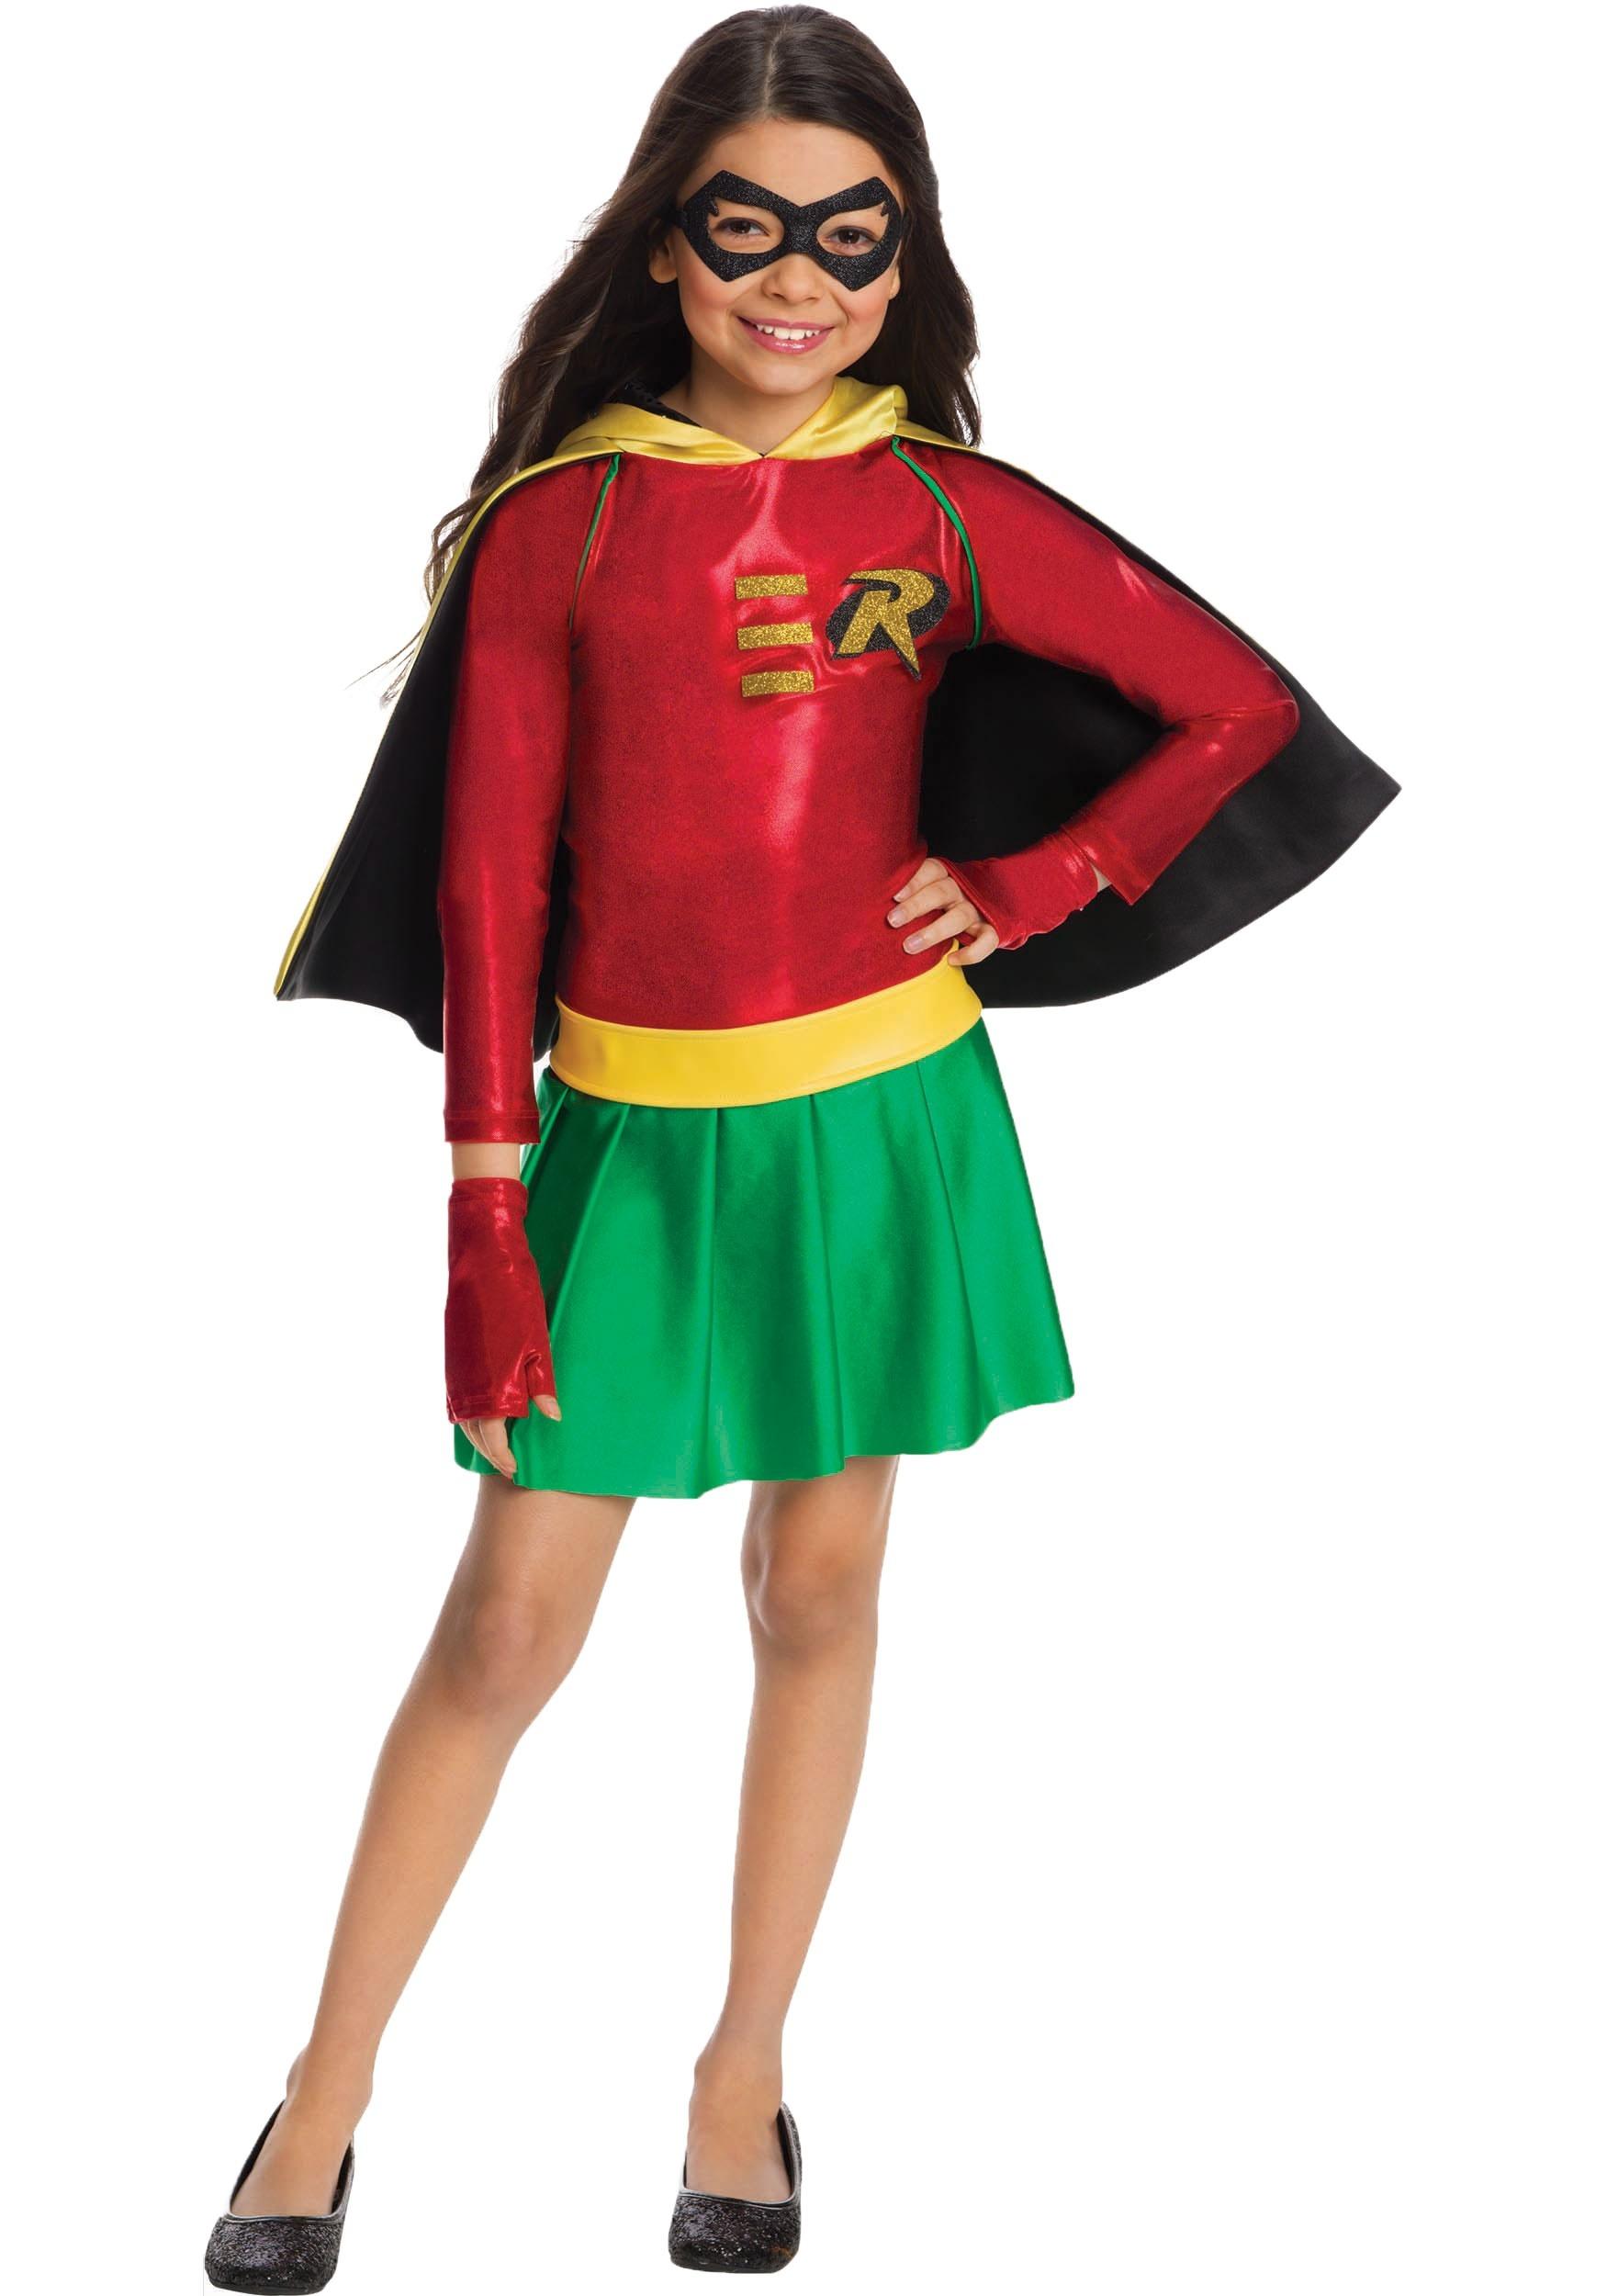 Girls Robin Costume  sc 1 st  Halloween Costumes & Girls Superhero Costumes - Child Teen Girls Superhero Costumes